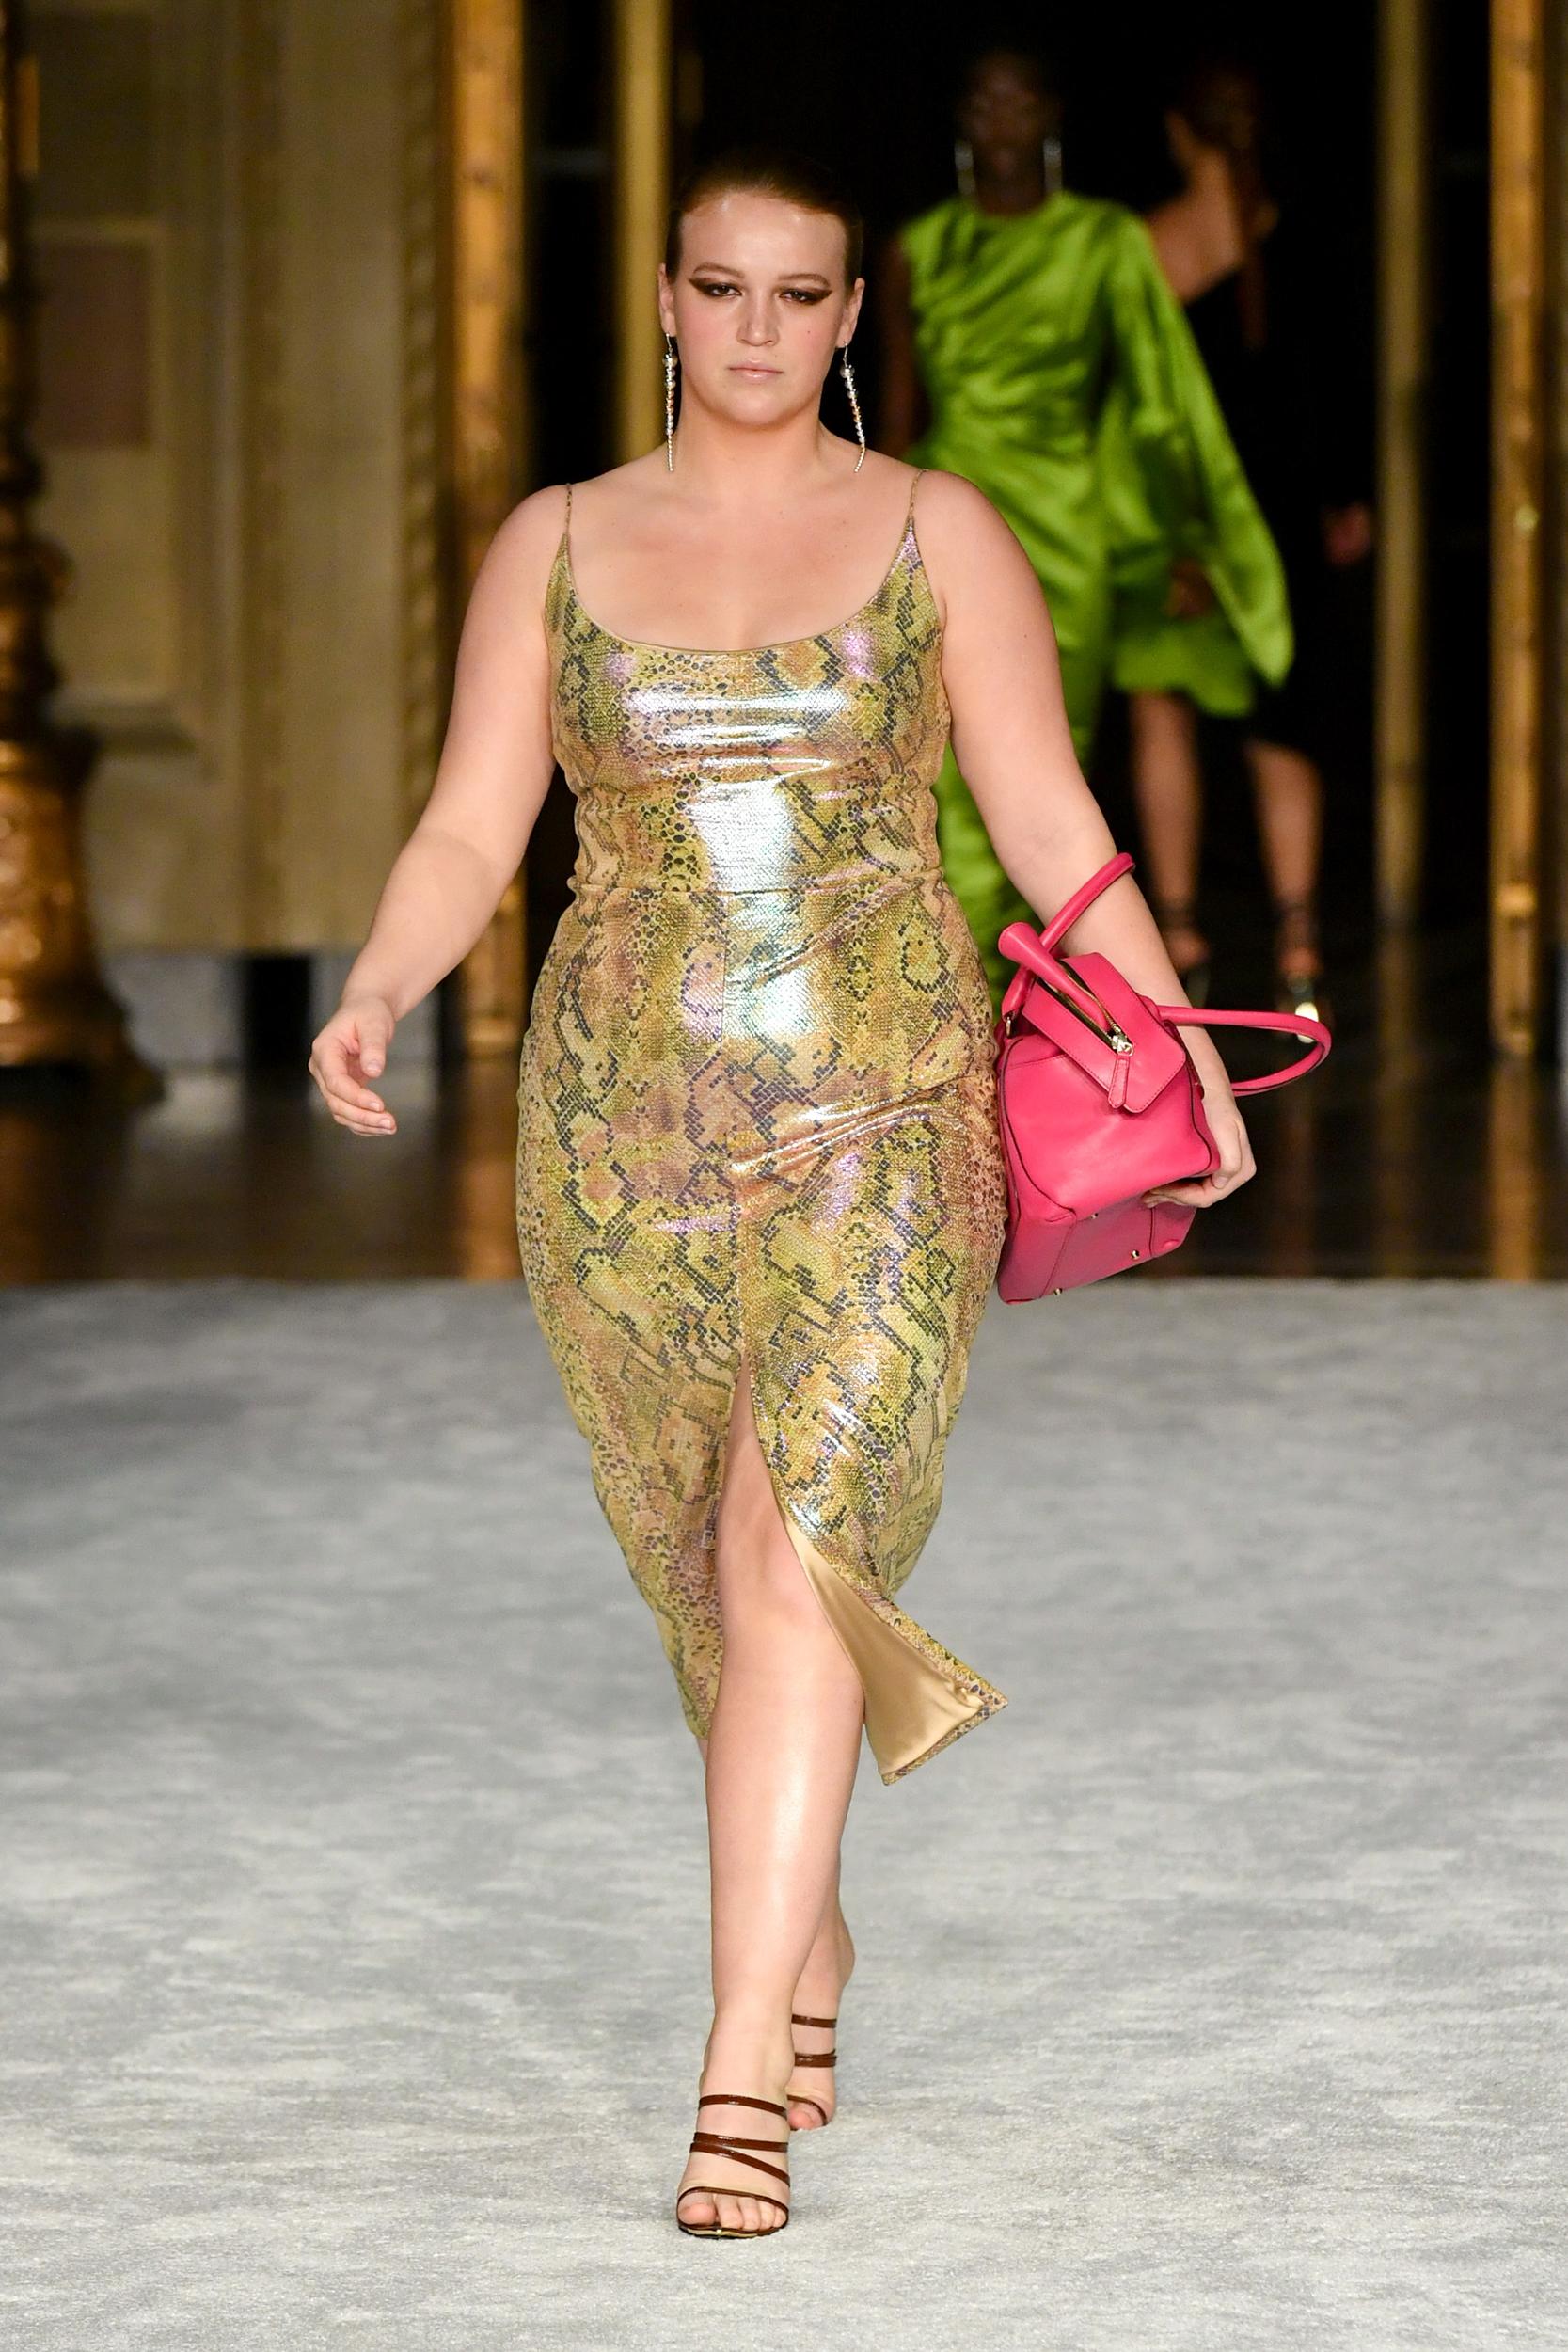 Christian Siriano Fall 2021 Fashion Show